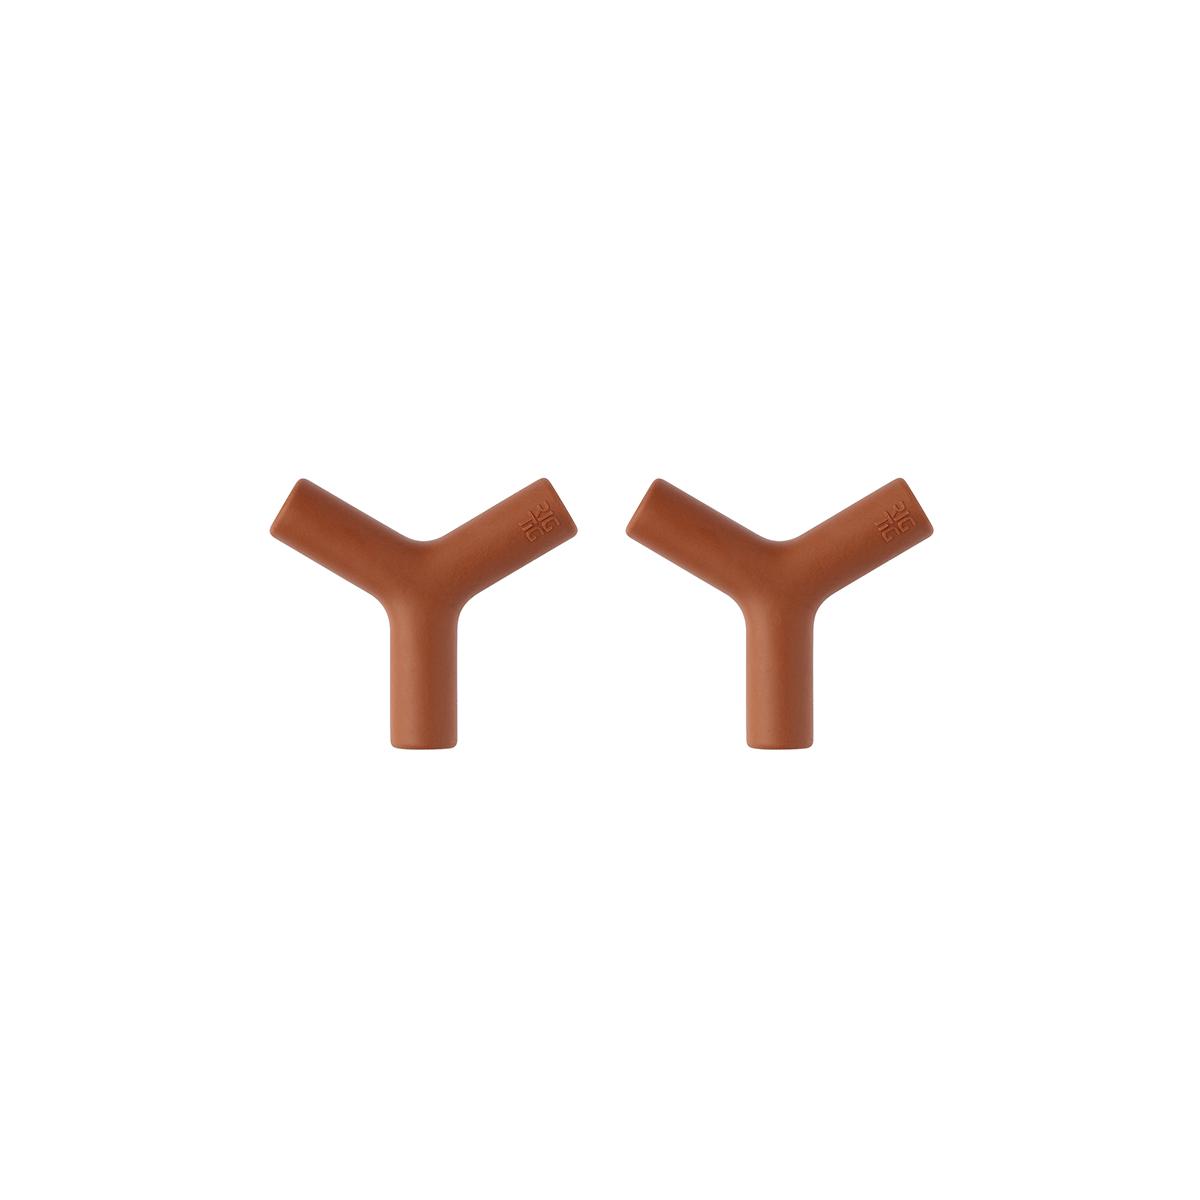 HANG_Z00057-1_HANG-IT_hooks_2pcs_terracotta